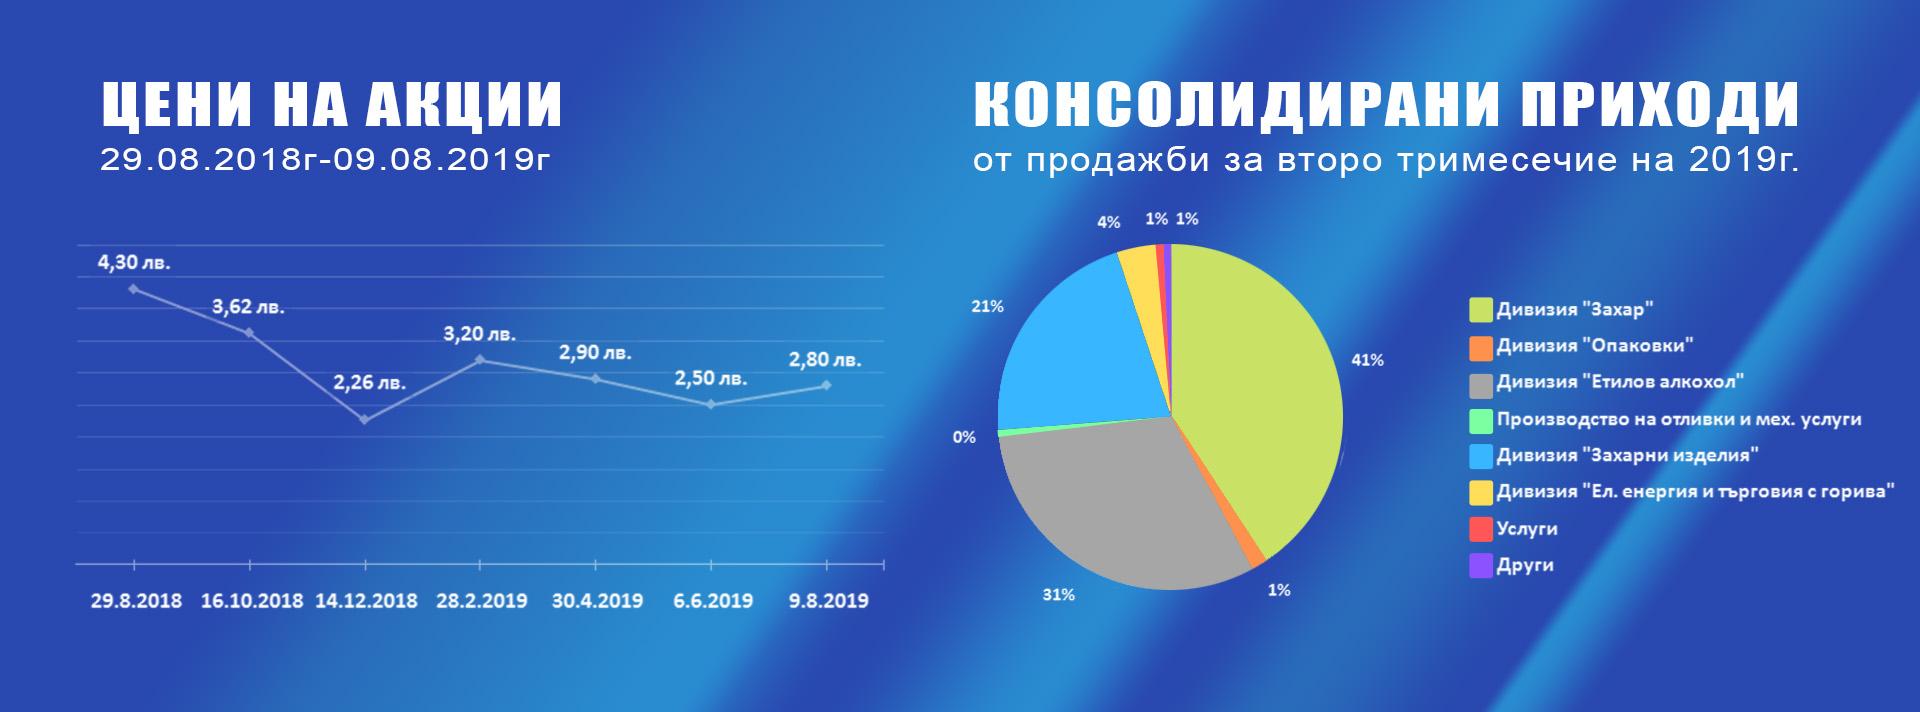 Investor Reports Image